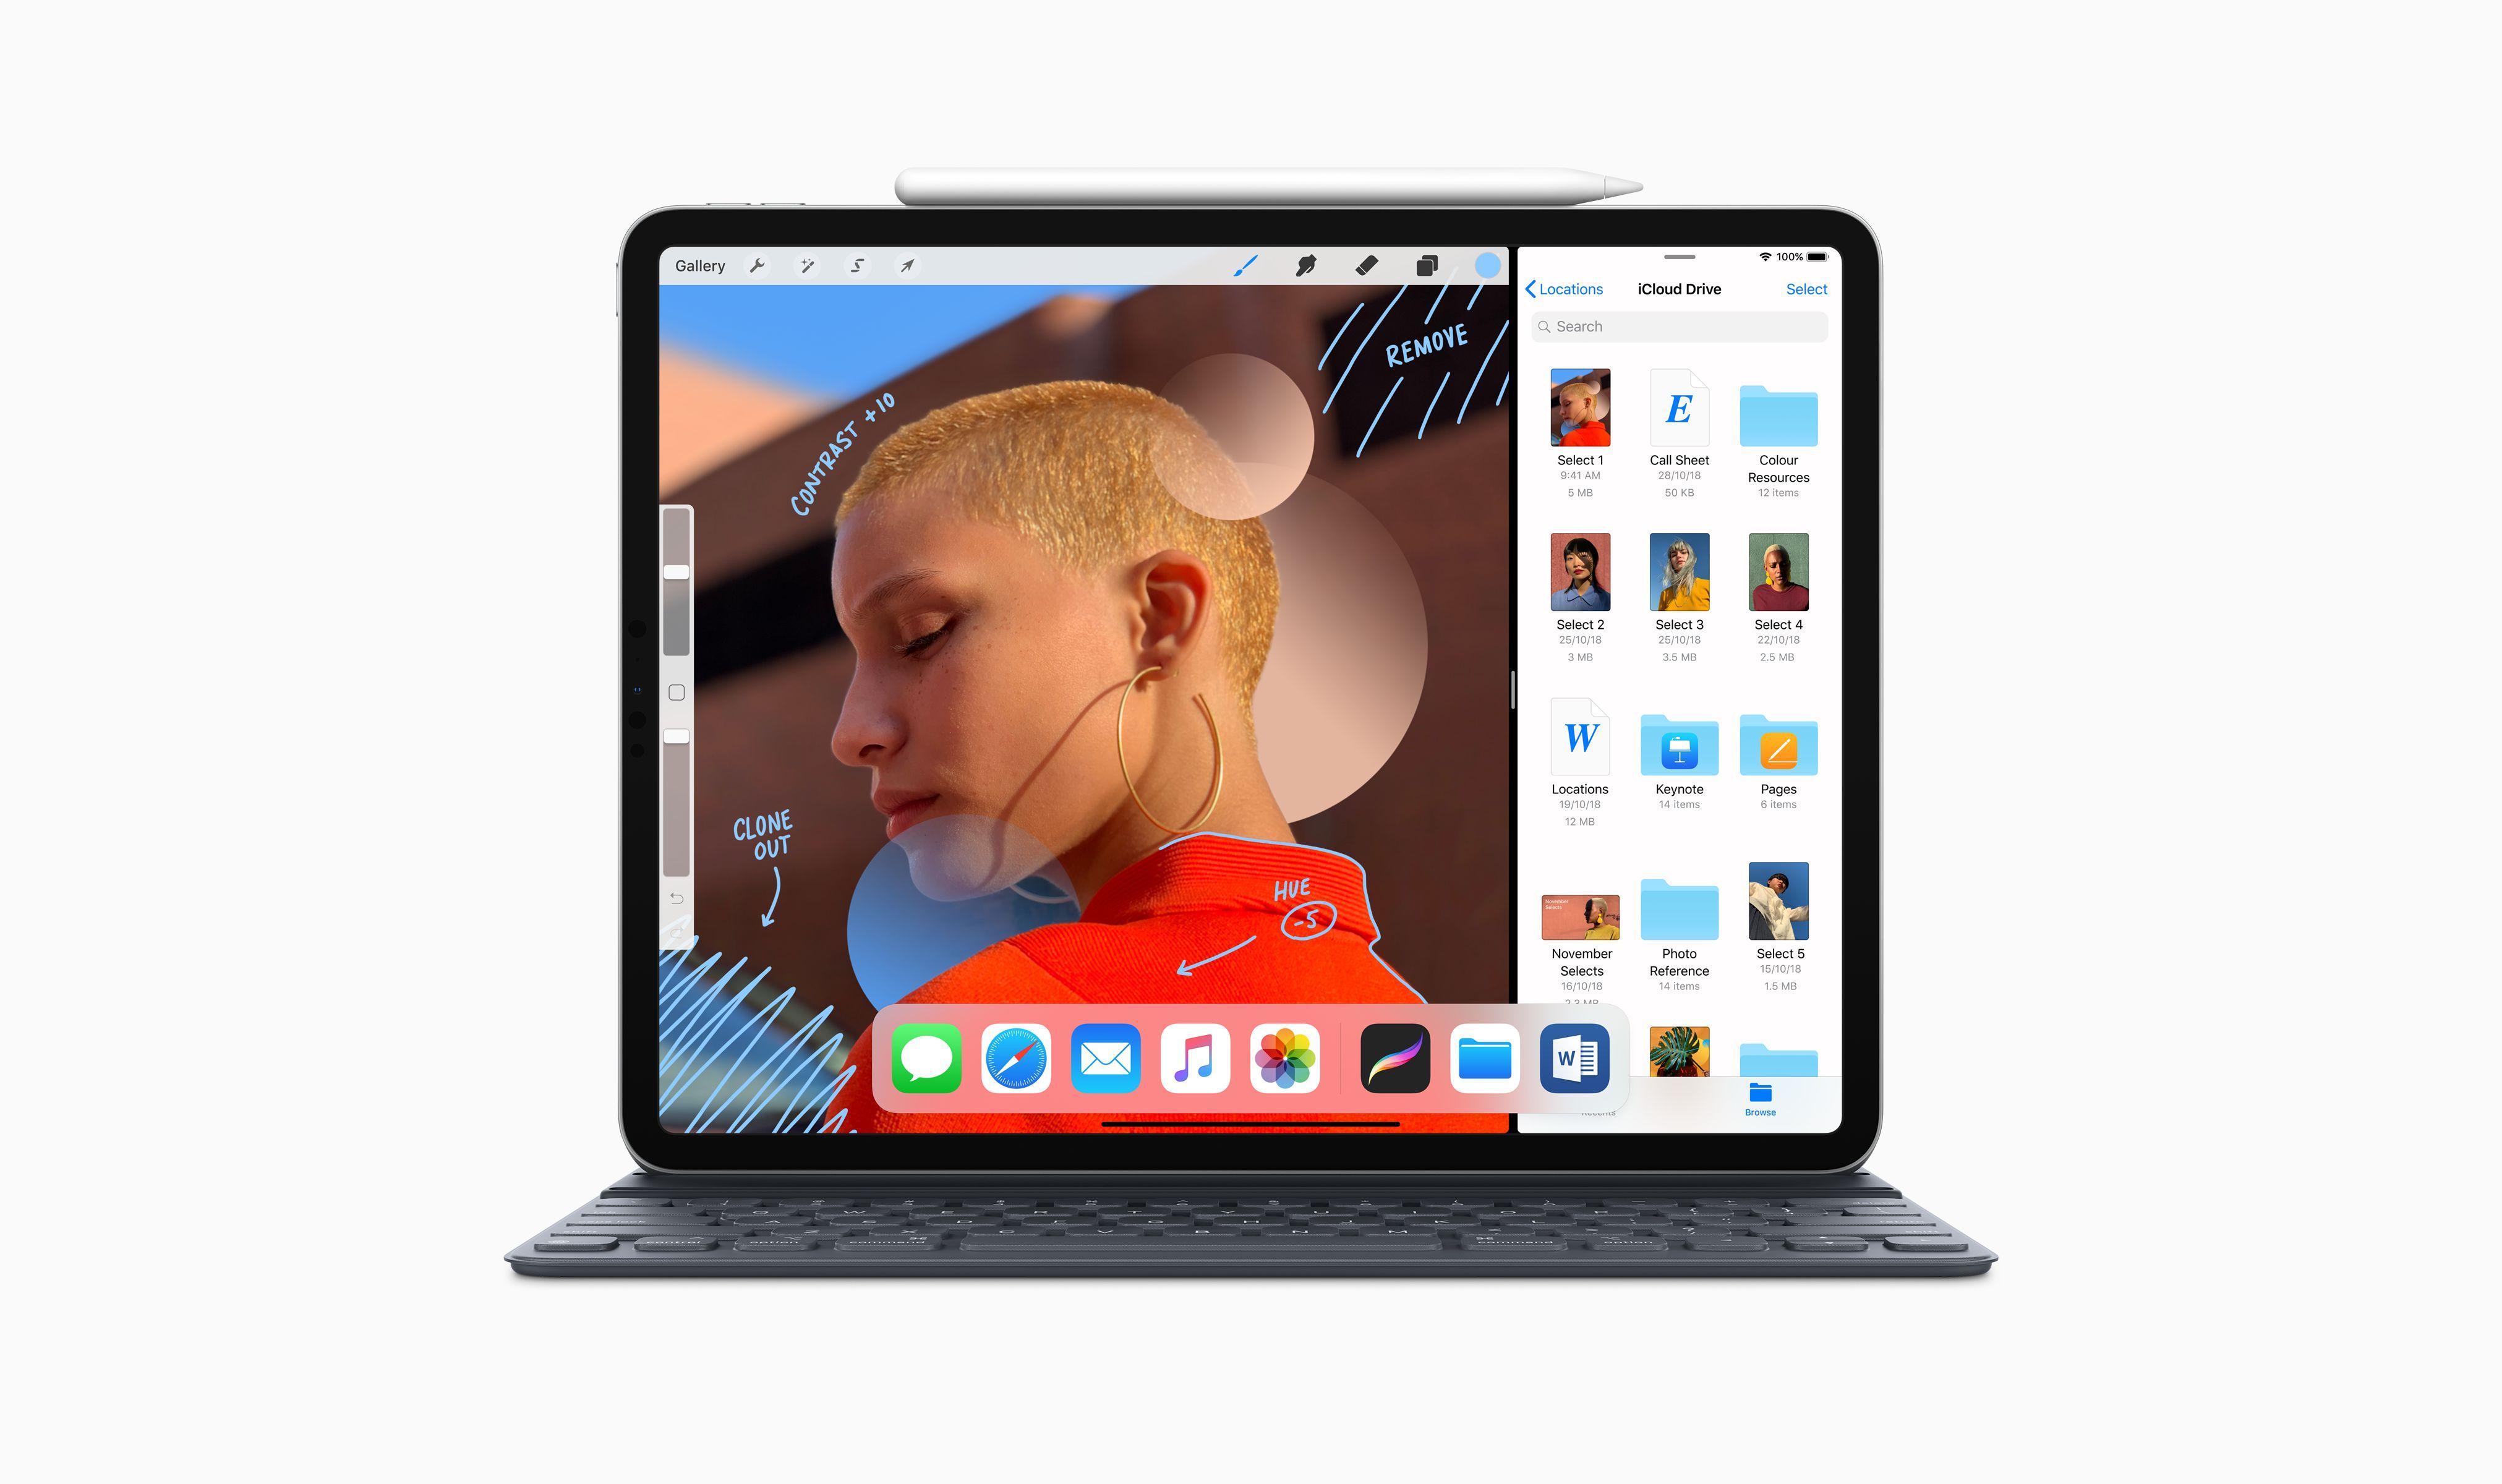 iPad Pro Singapore